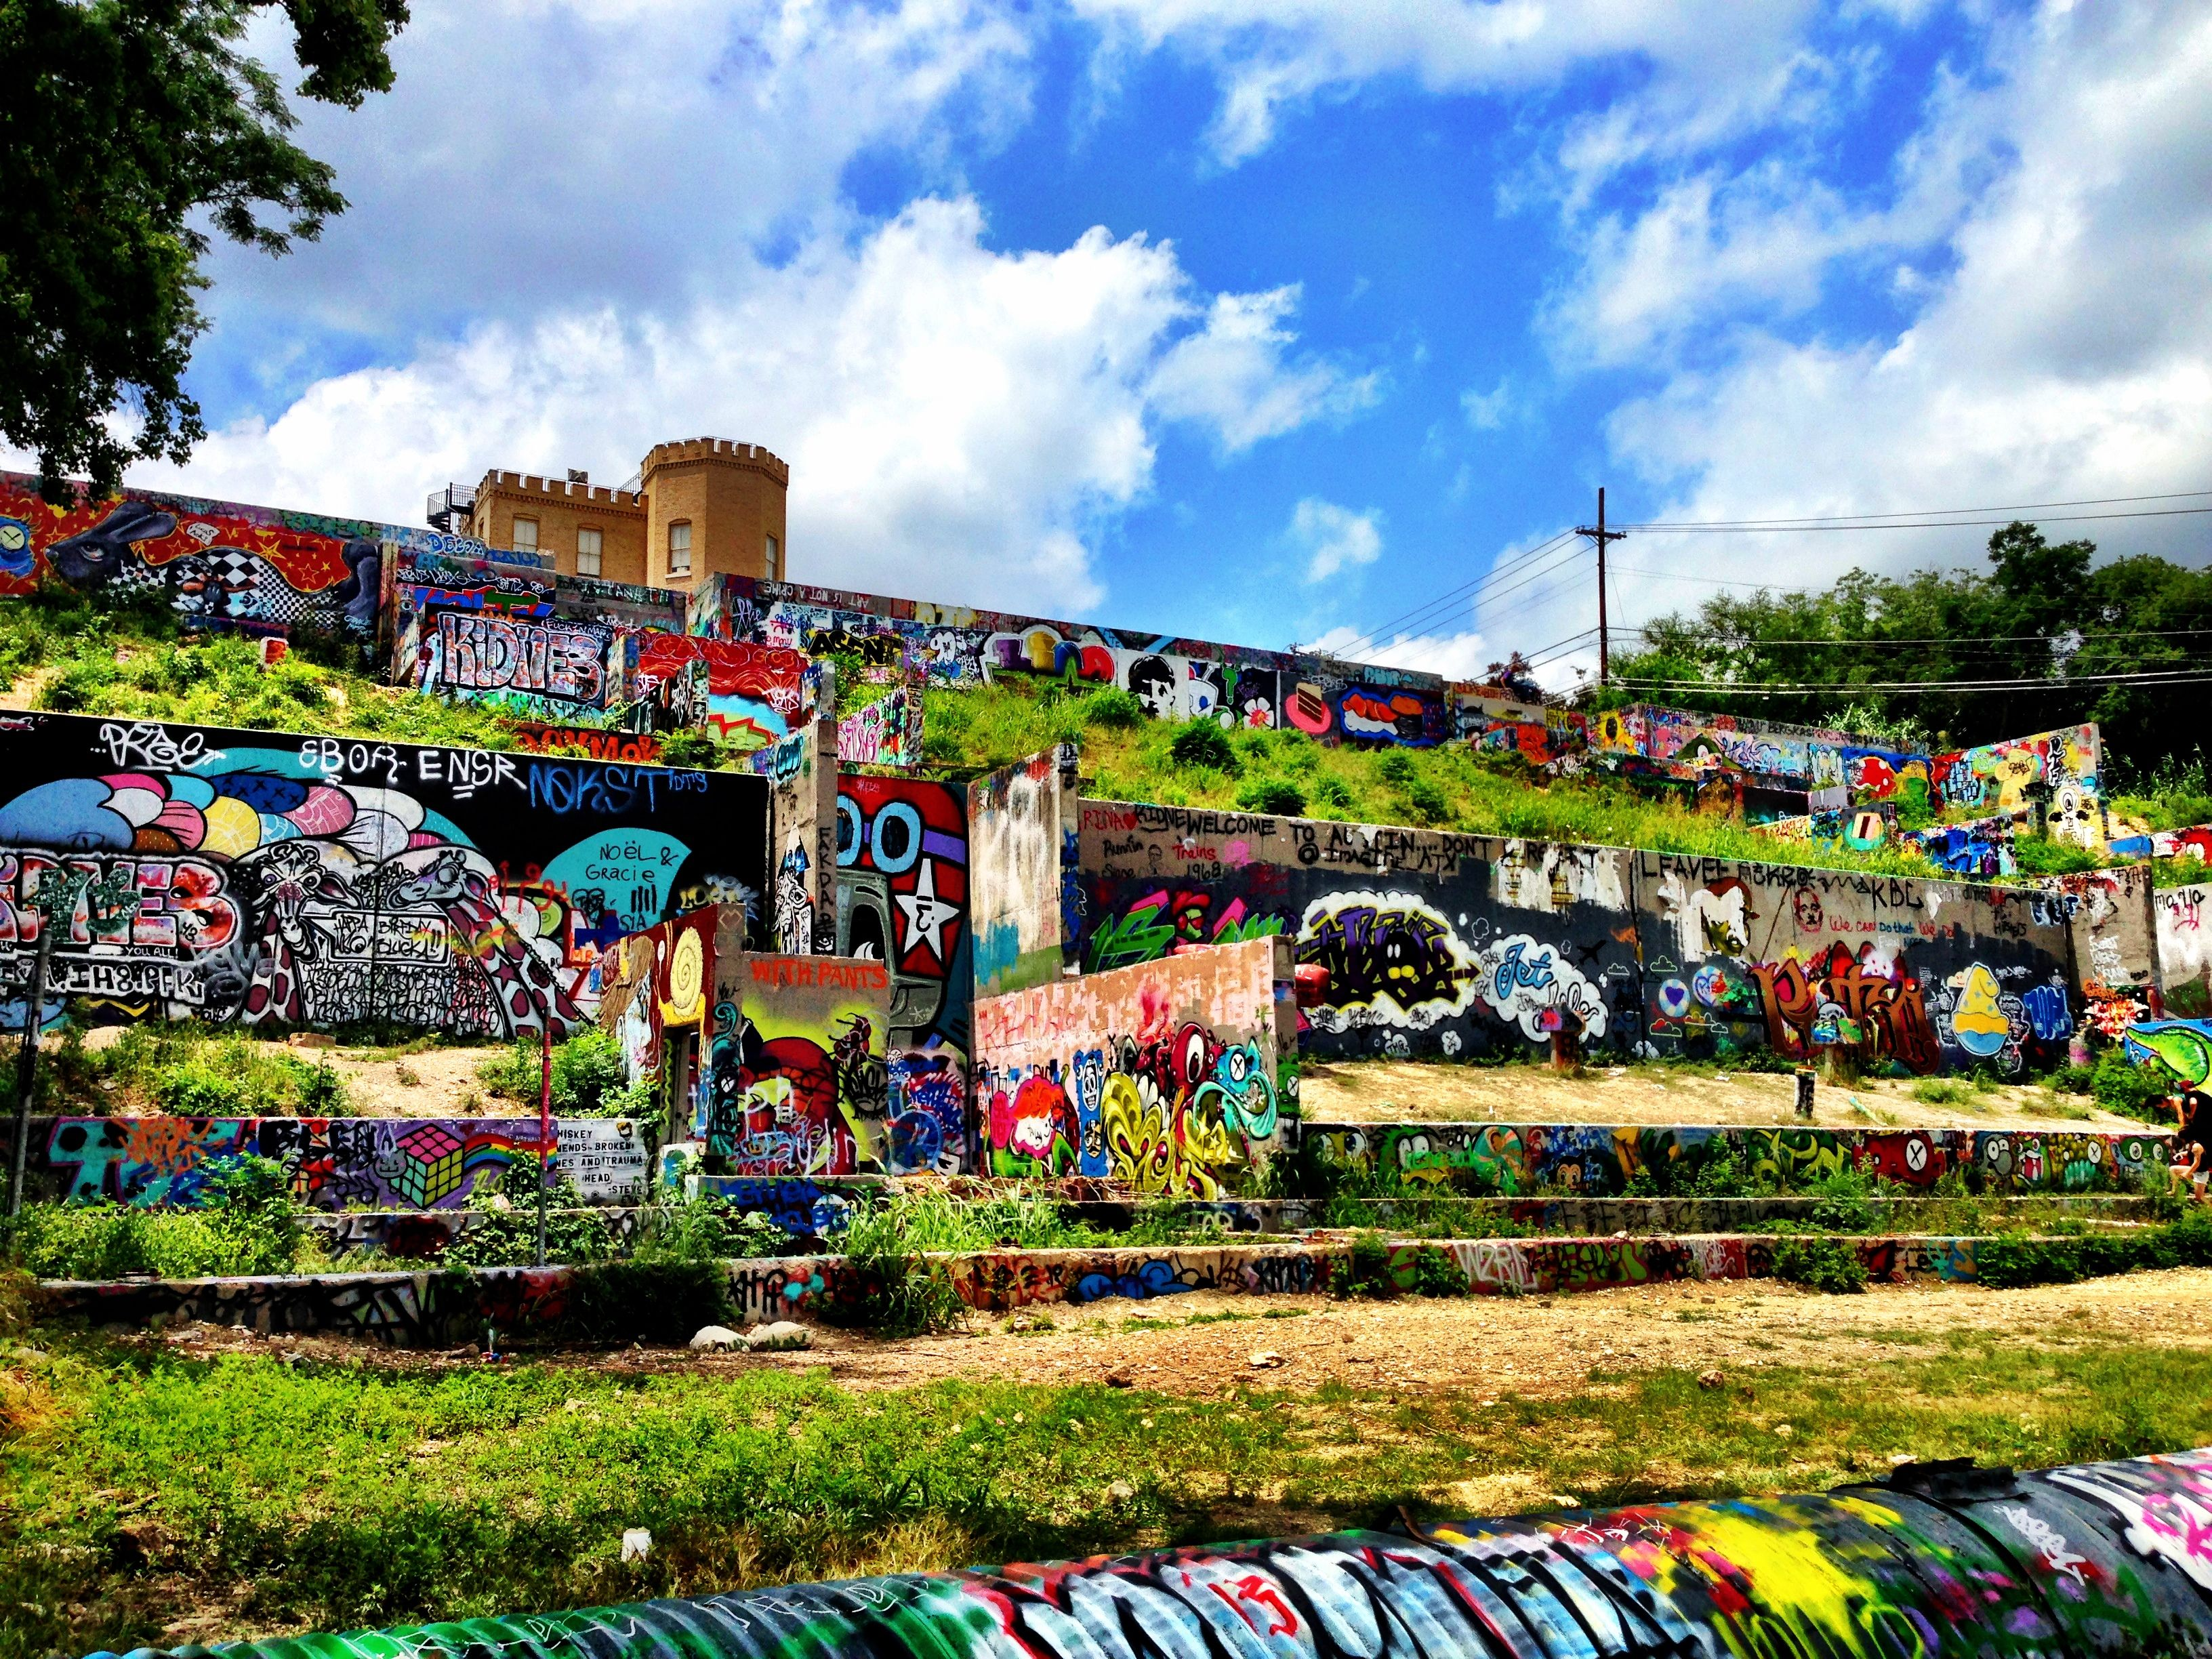 92 12 Baylor Street Art Wall 365 Things To Do In Austin Tx Visit Austin Trip Texas Travel